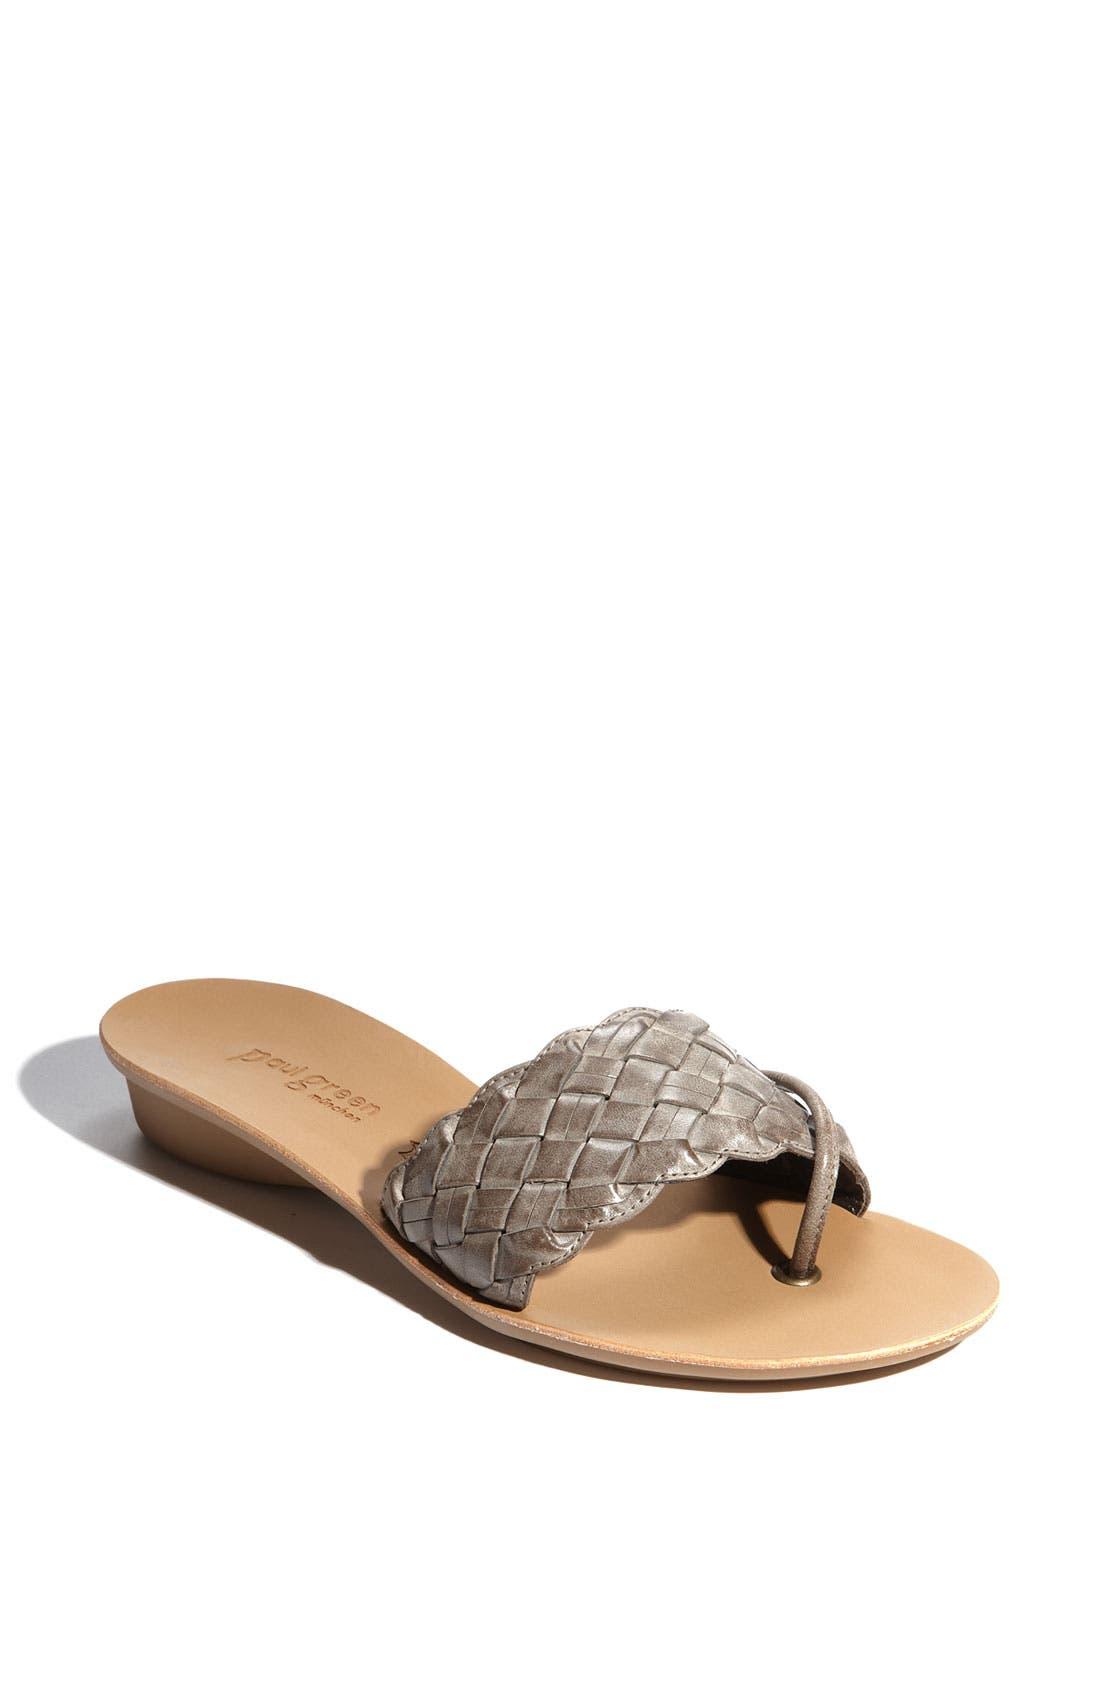 Main Image - Paul Green 'Lulu' Sandal